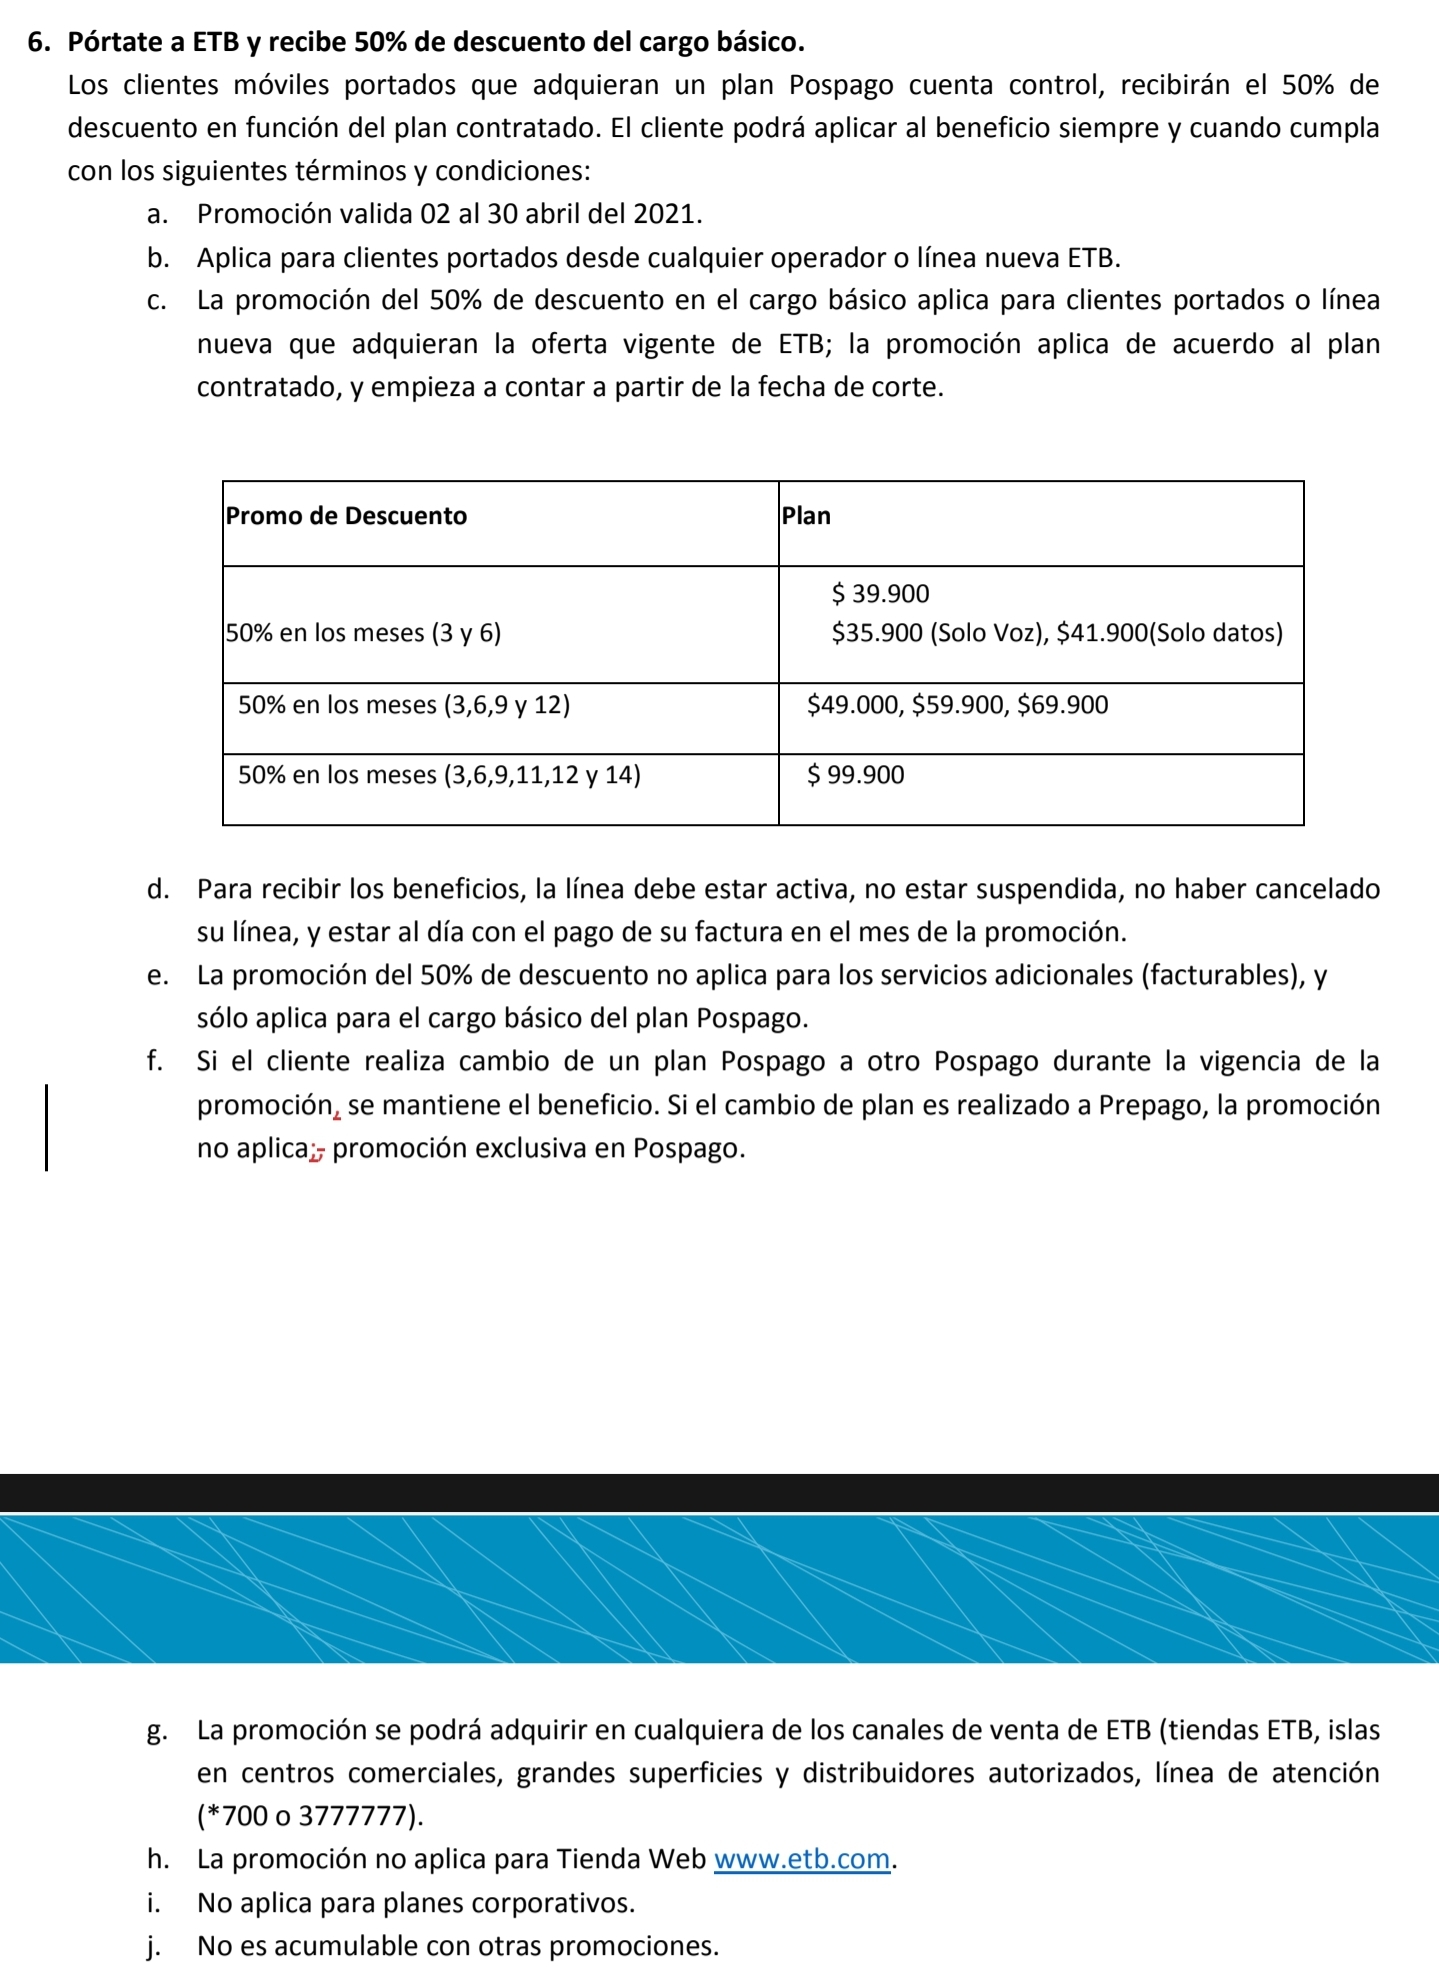 Screenshot_20210425-101339_Samsung Notes.jpg